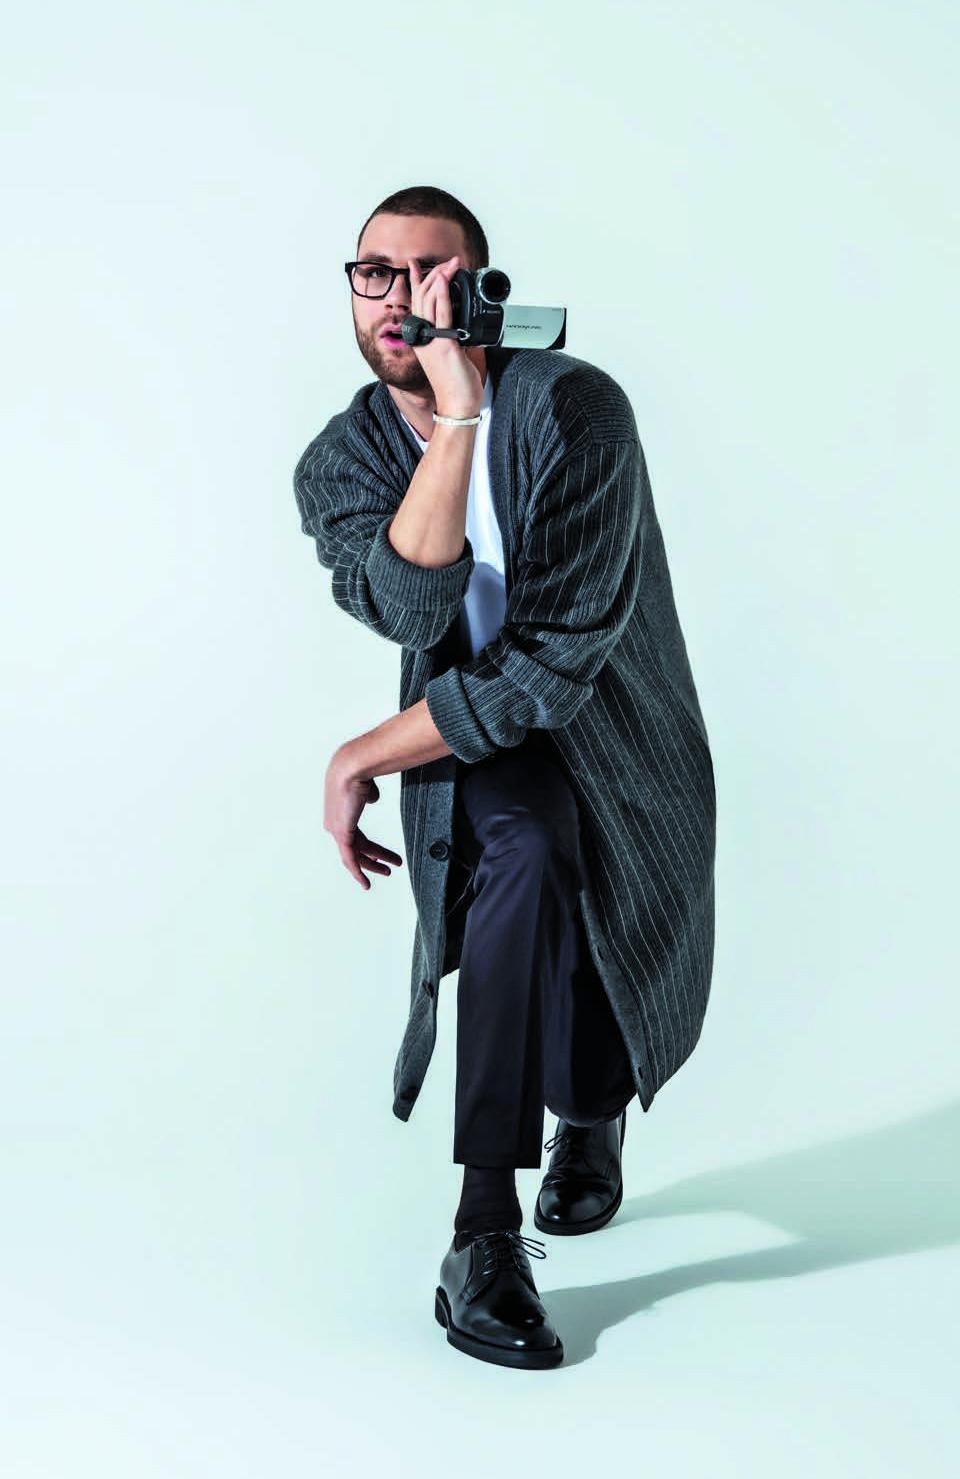 Кардиган Fendi; футболка Henderson; брюки Dolce & Gabbana; носки Falke; дерби Barrett; очки Prada